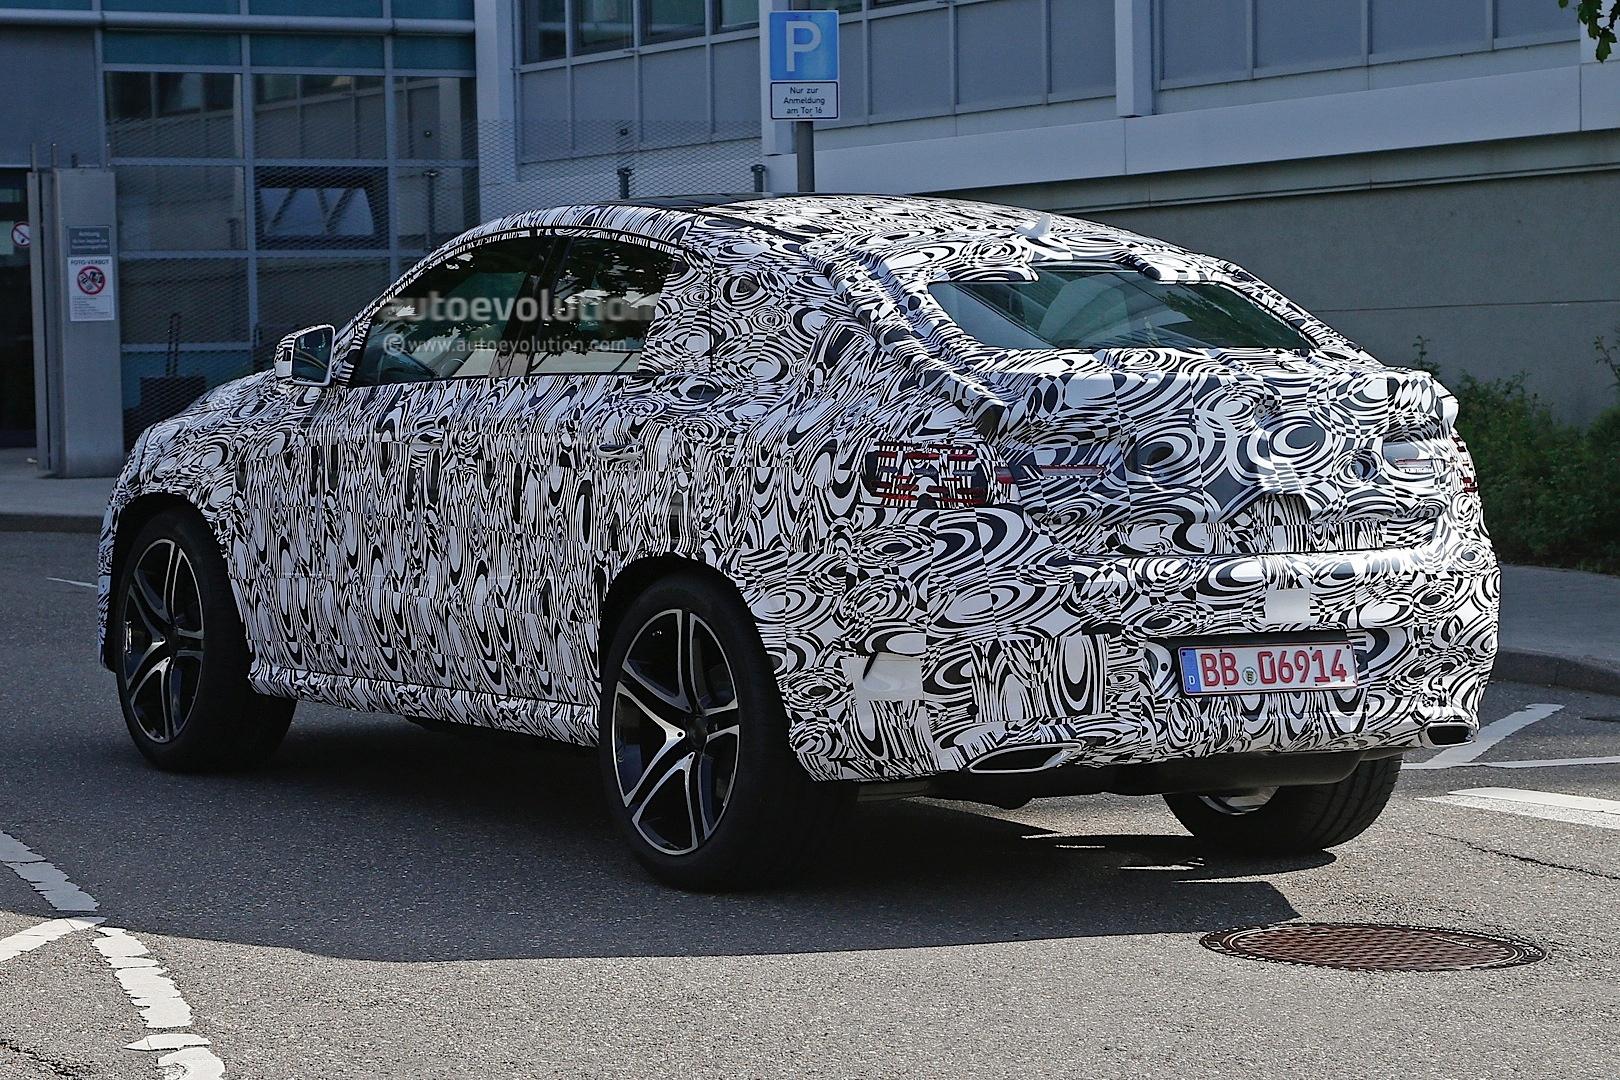 2015 Mercedes-Benz MLC vs 2015 BMW X6 Spyshots - autoevolution